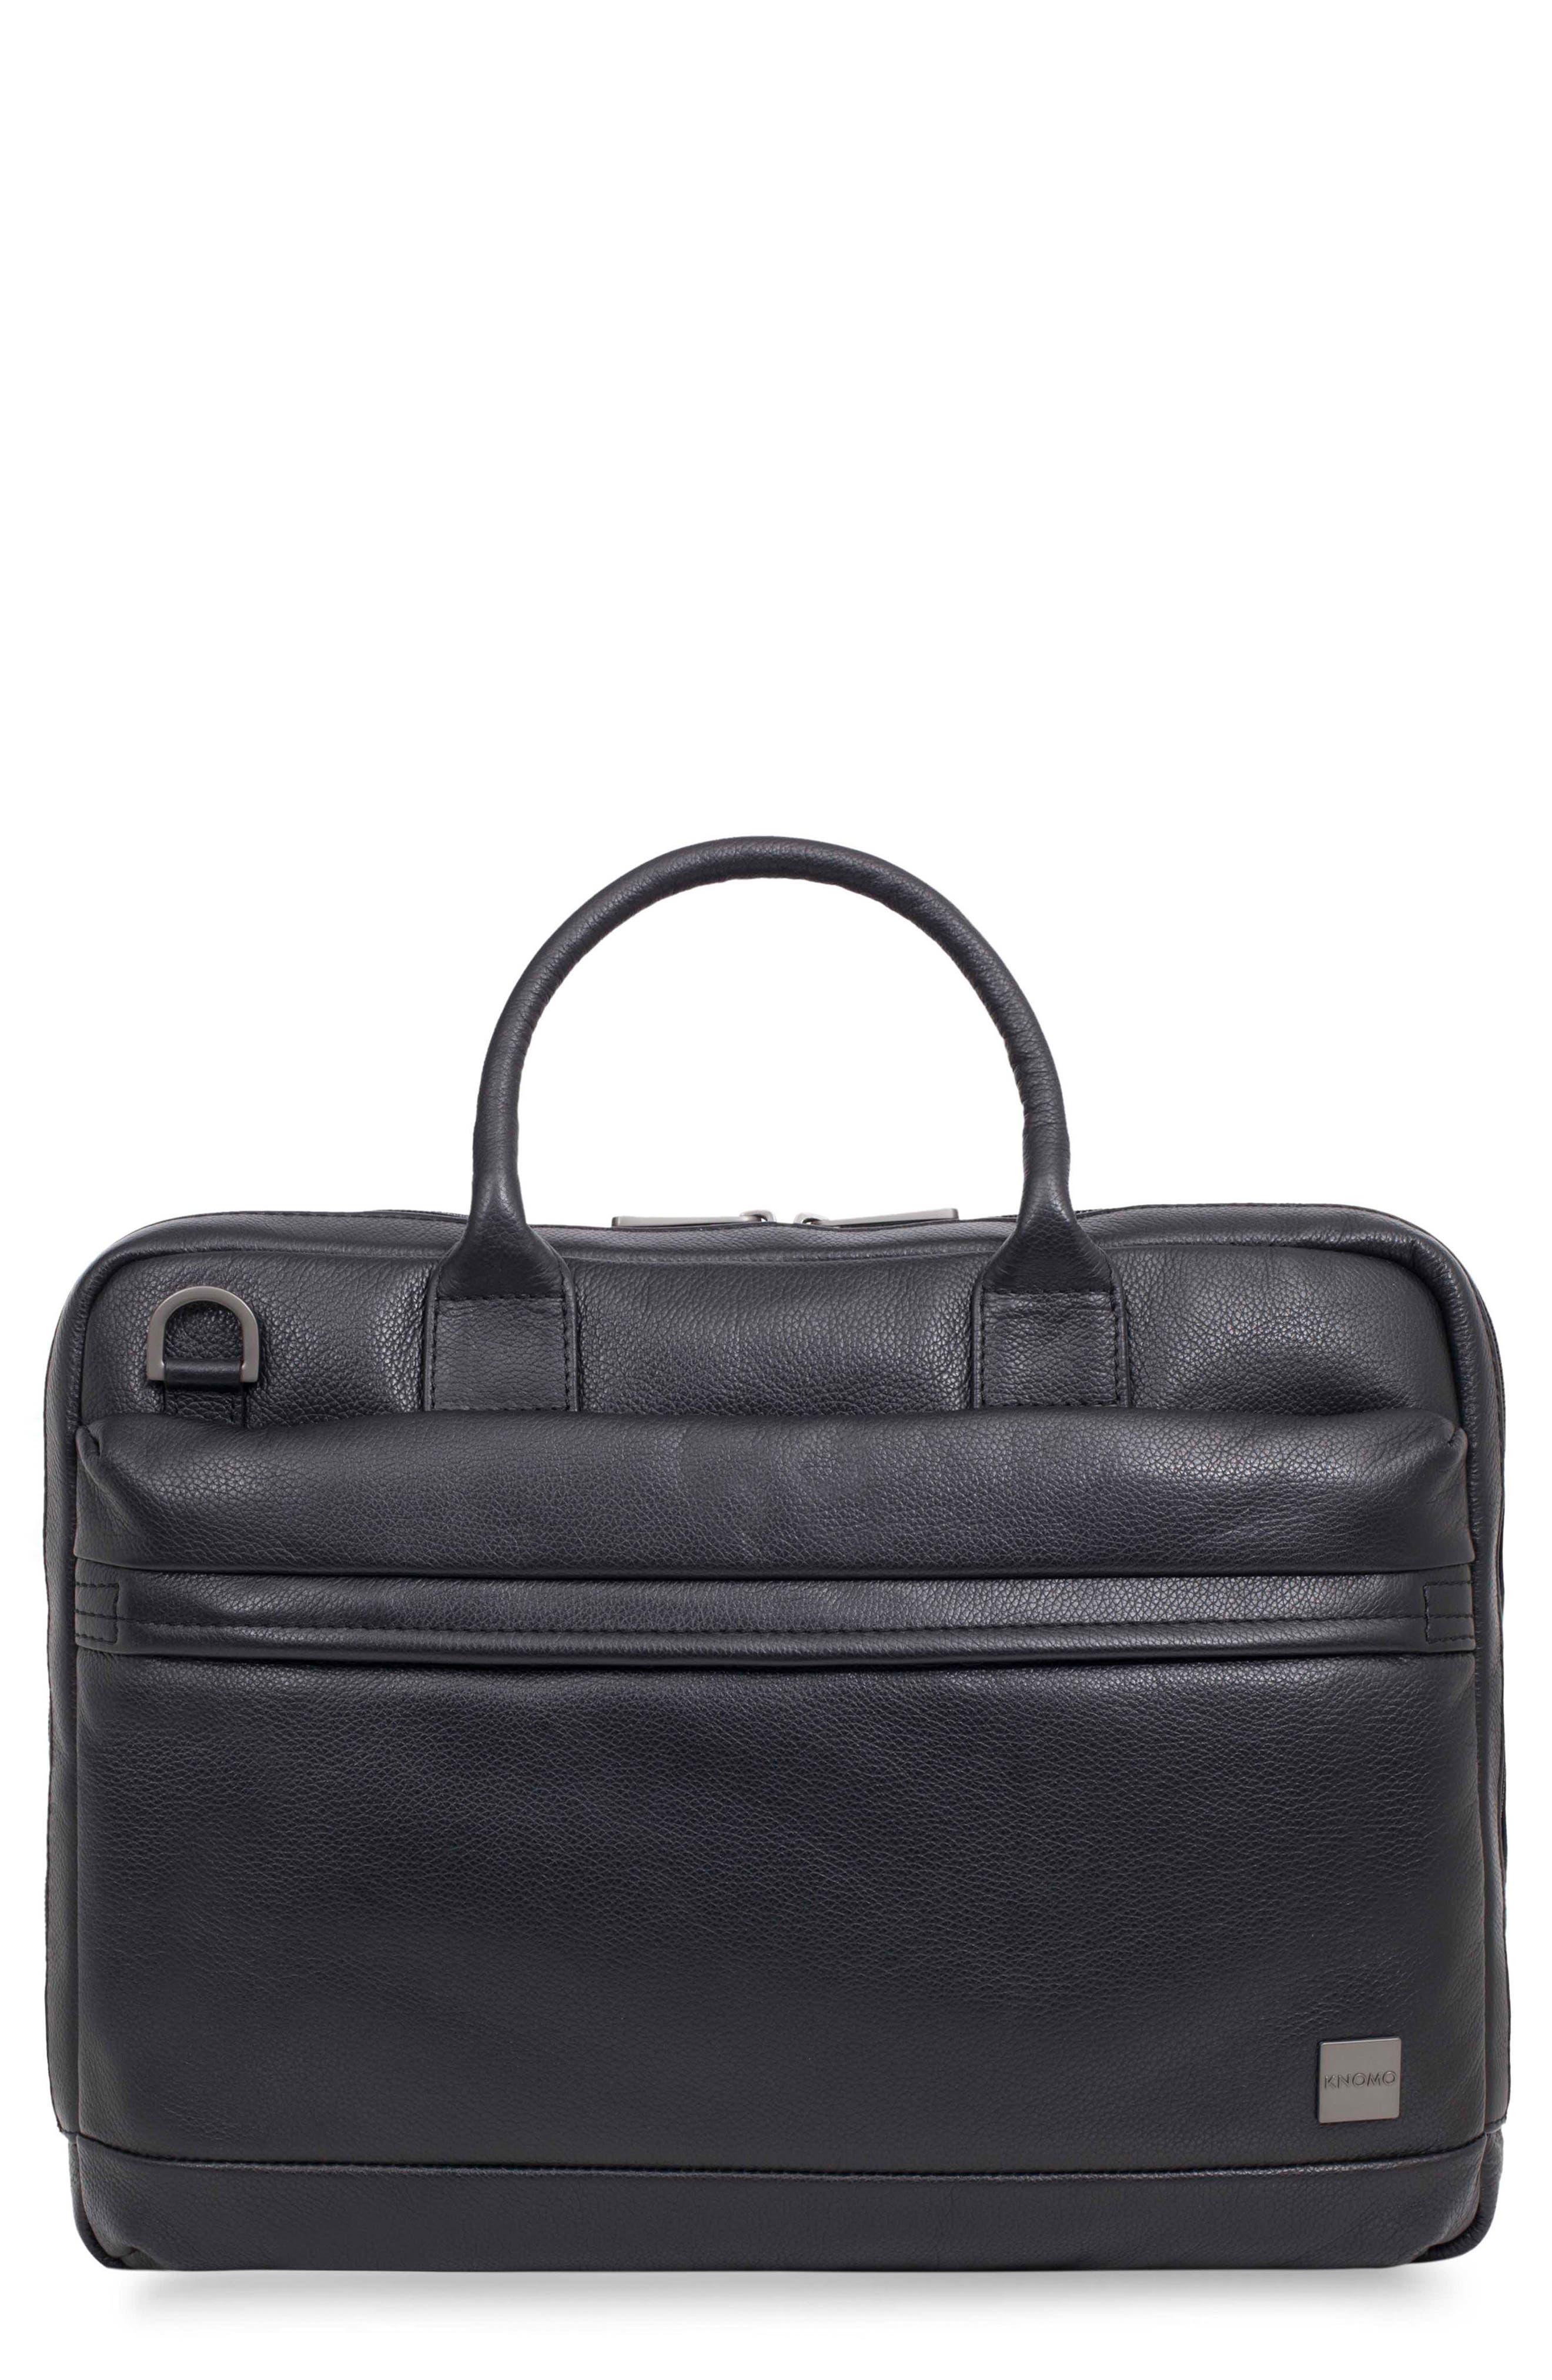 Barbican Foster Leather Briefcase,                         Main,                         color, BLACK